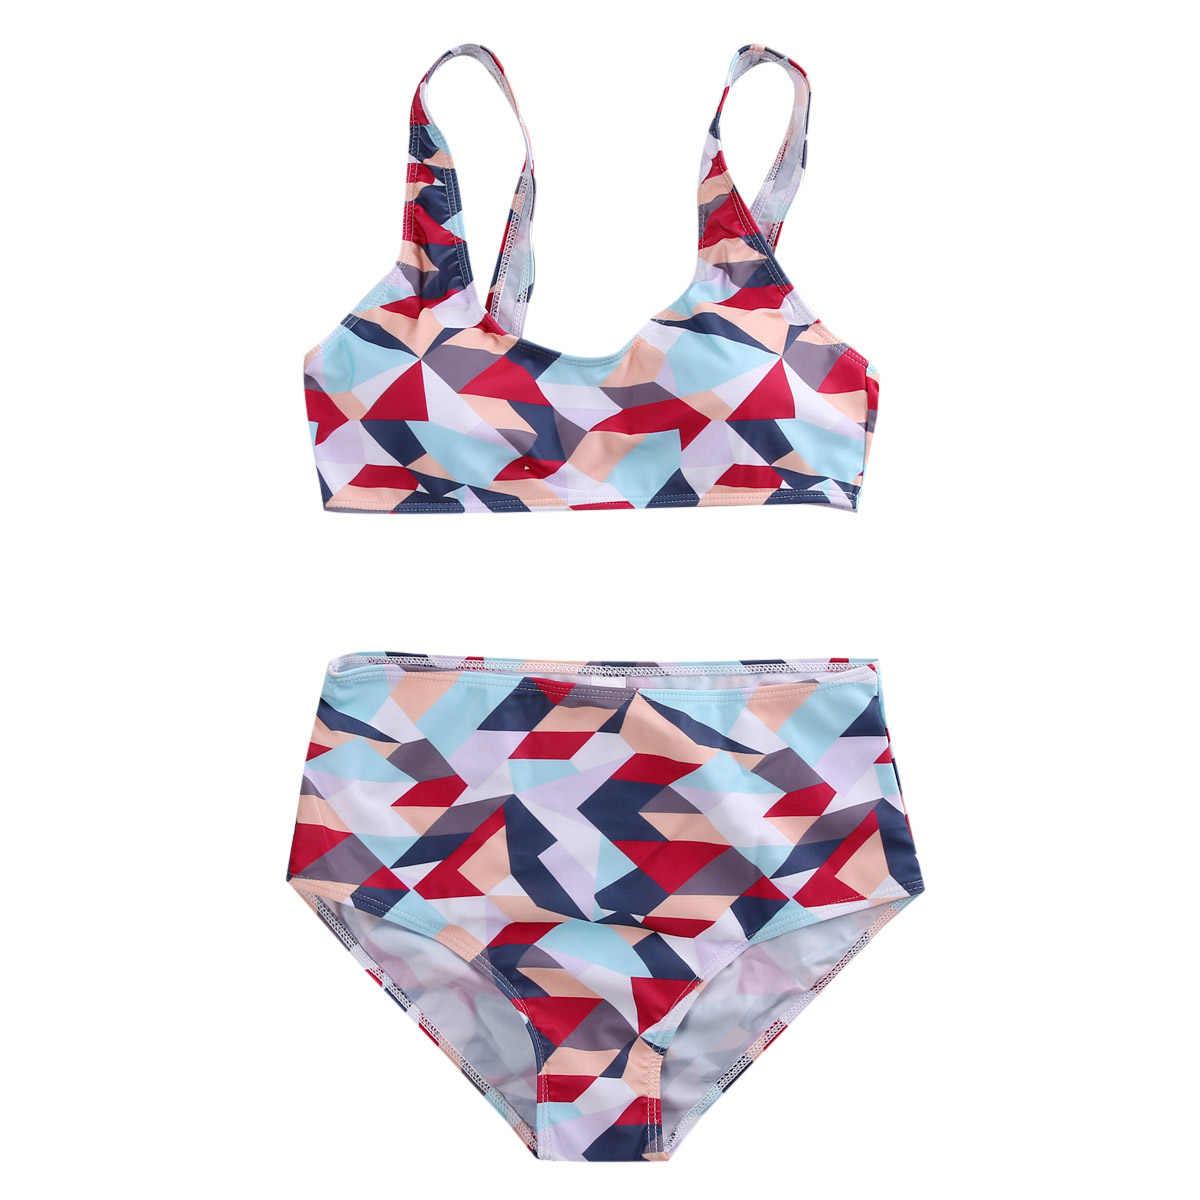 39352f8863d8 Women 2016 Print High Waist Bikini Floral Swimsuits Women Brazilian Push Up  Bikini Set Bathing Suits Plus Size Swimwear XXL